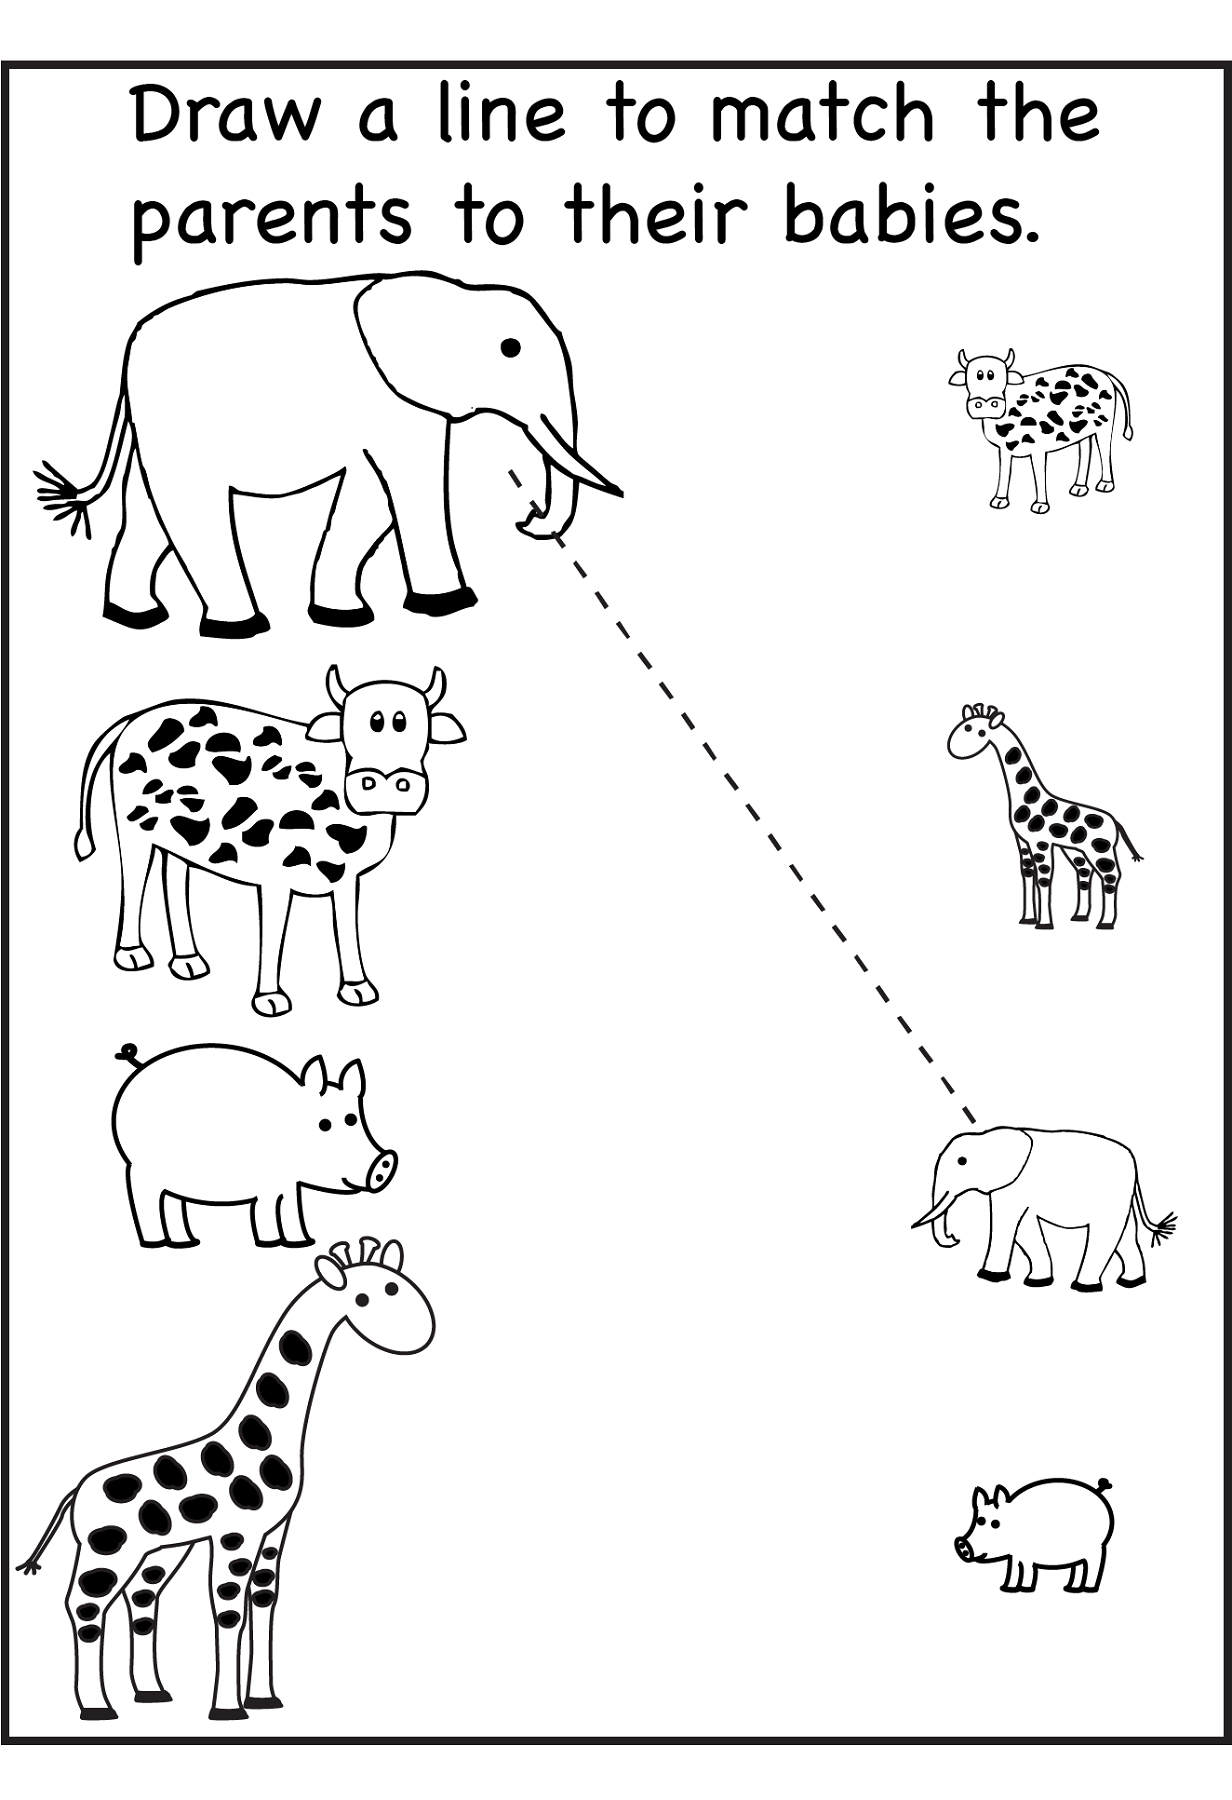 Printable Activity Sheets For Kids | Kids Worksheets Printable - Free Printable Activity Sheets For Kids